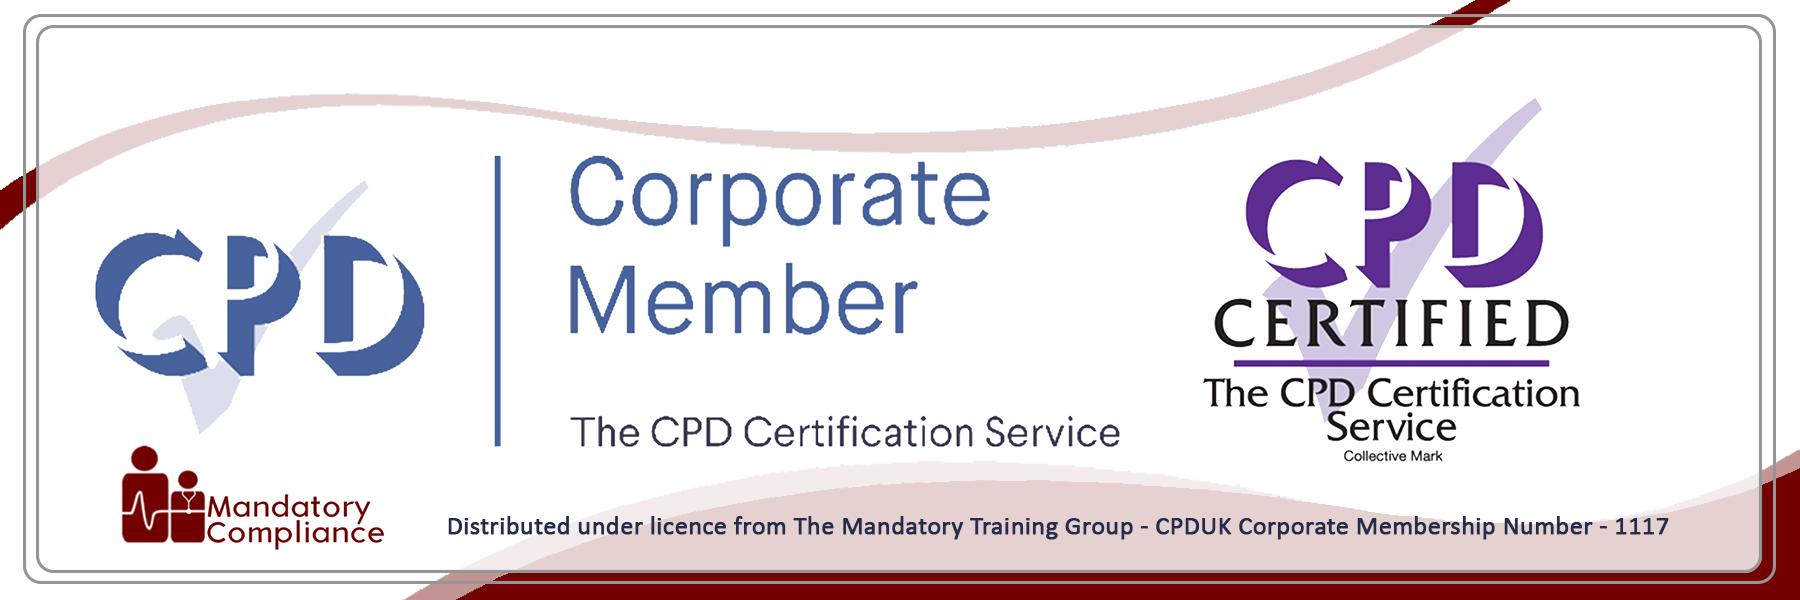 Talent Management - E-Learning Courses - Mandatory Compliance UK -